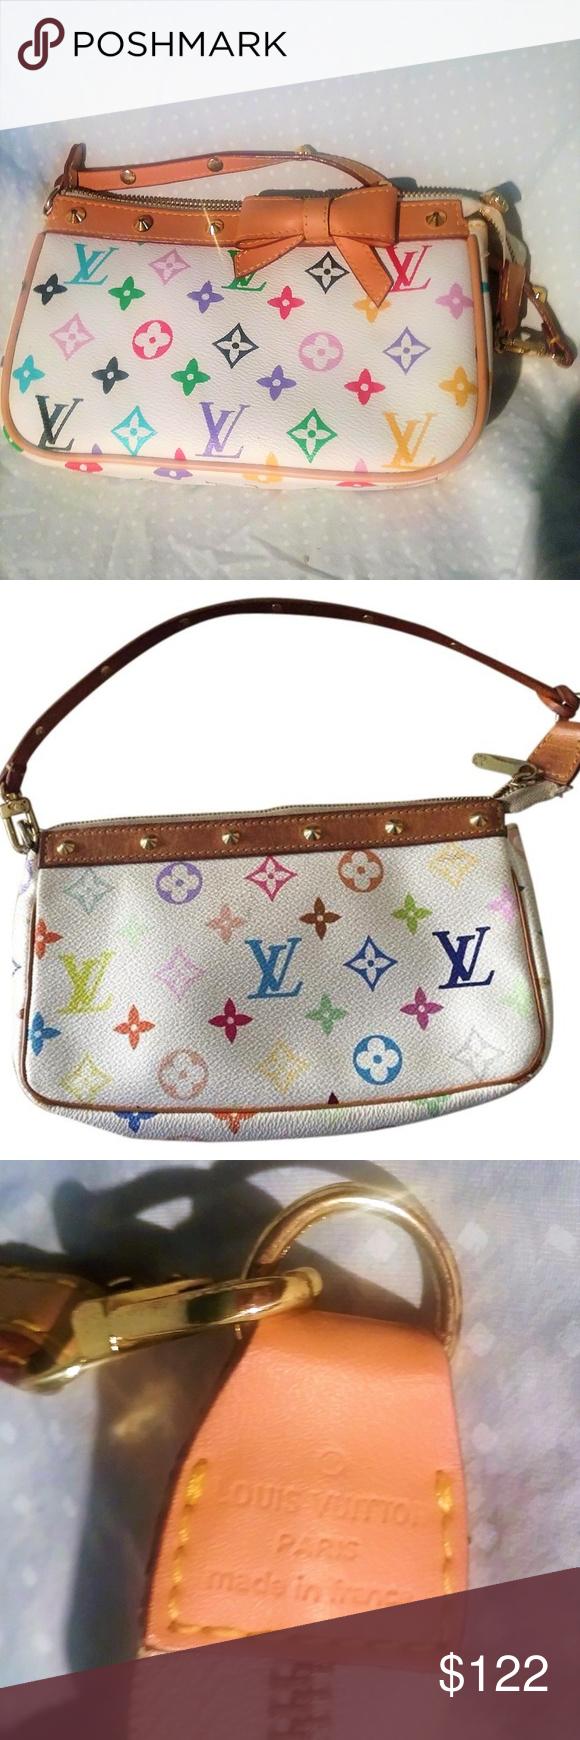 e09e083ef7f2 Louis Vuitton Bow Louis Vuitton Bow Pochette White Murakami Monogram Canvas  Studded Multicolor Leather Louis Vuitton Bags Clutches   Wristlets